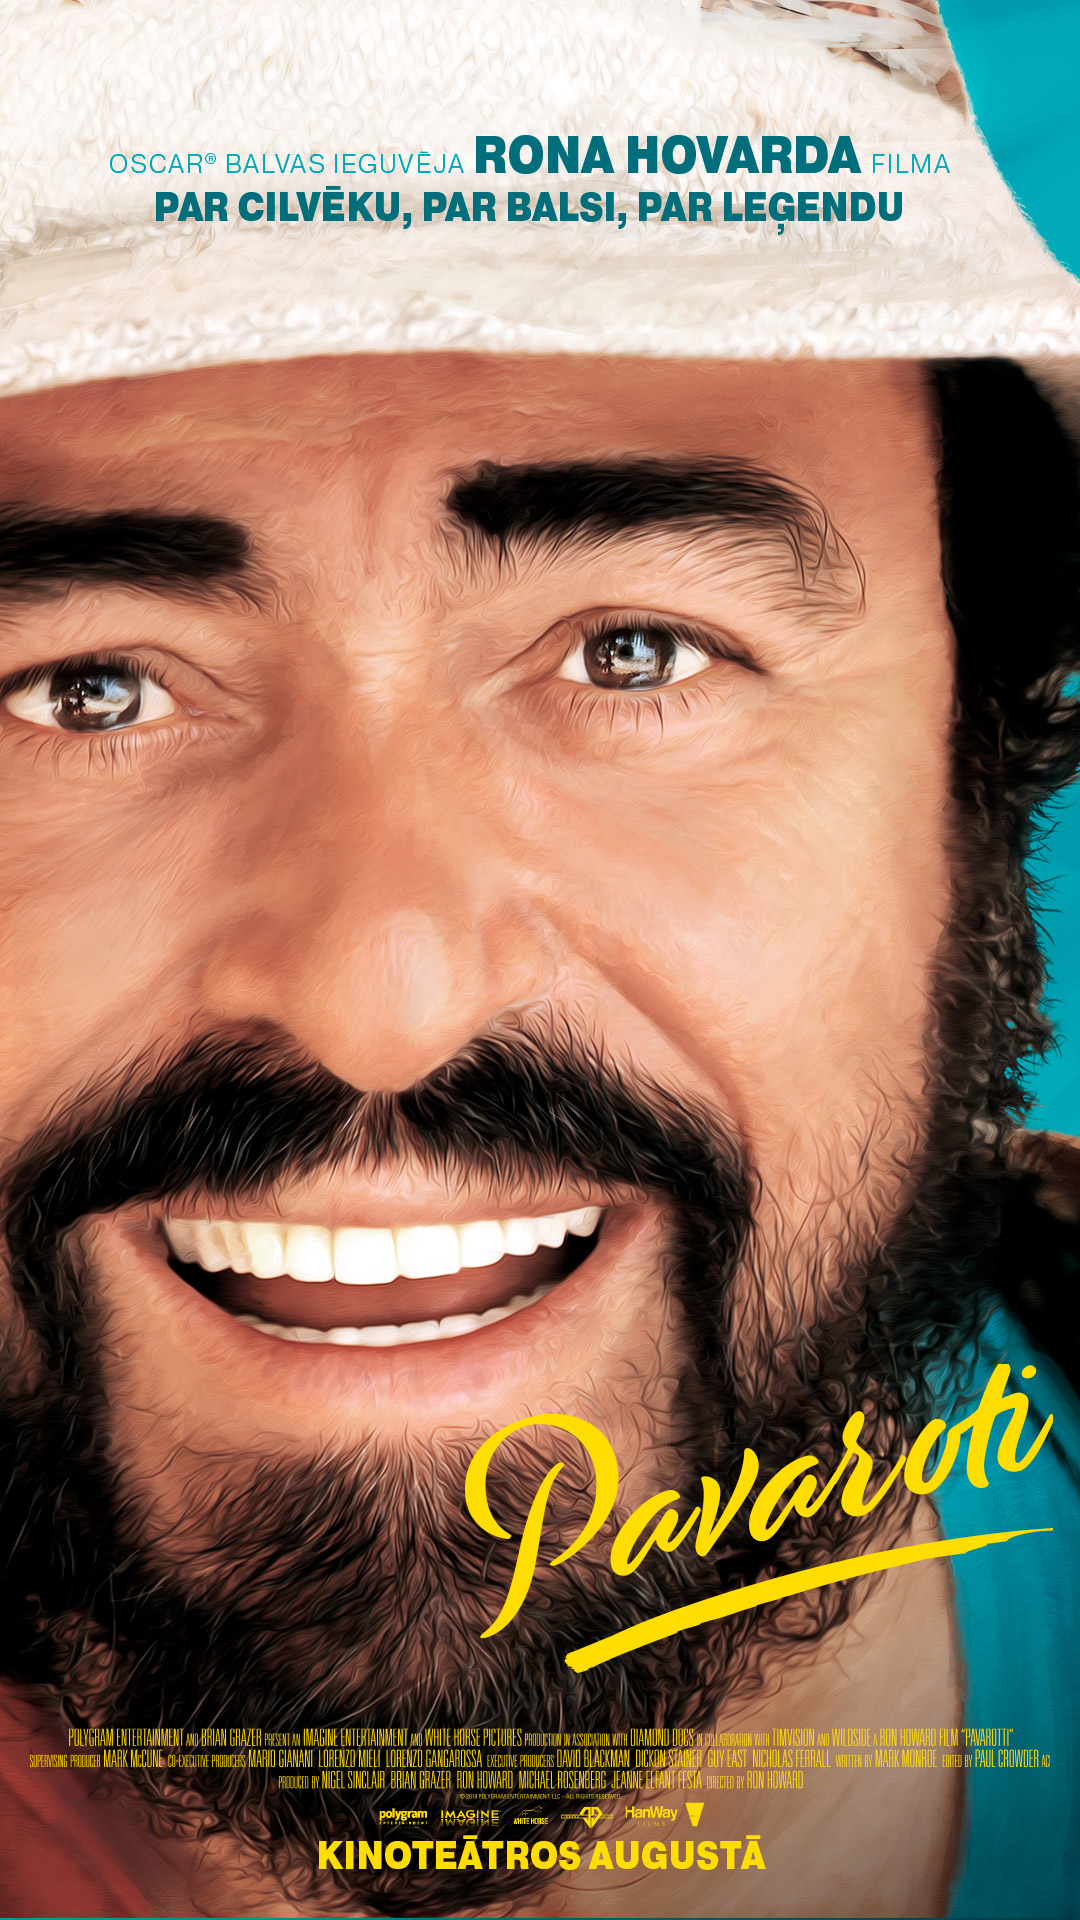 Pavarotti_HD_poster_1080x1920px_LV_v2.jpg